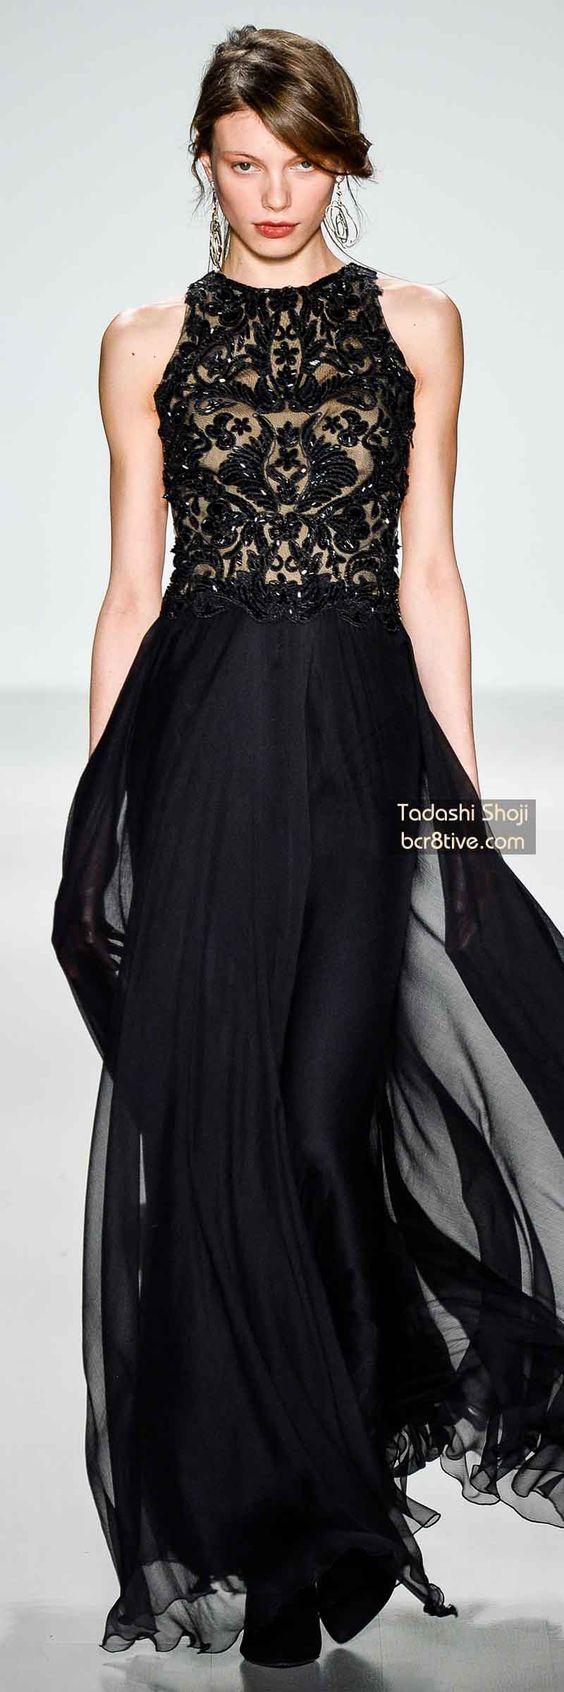 The best images about dresses on pinterest lanvin latest